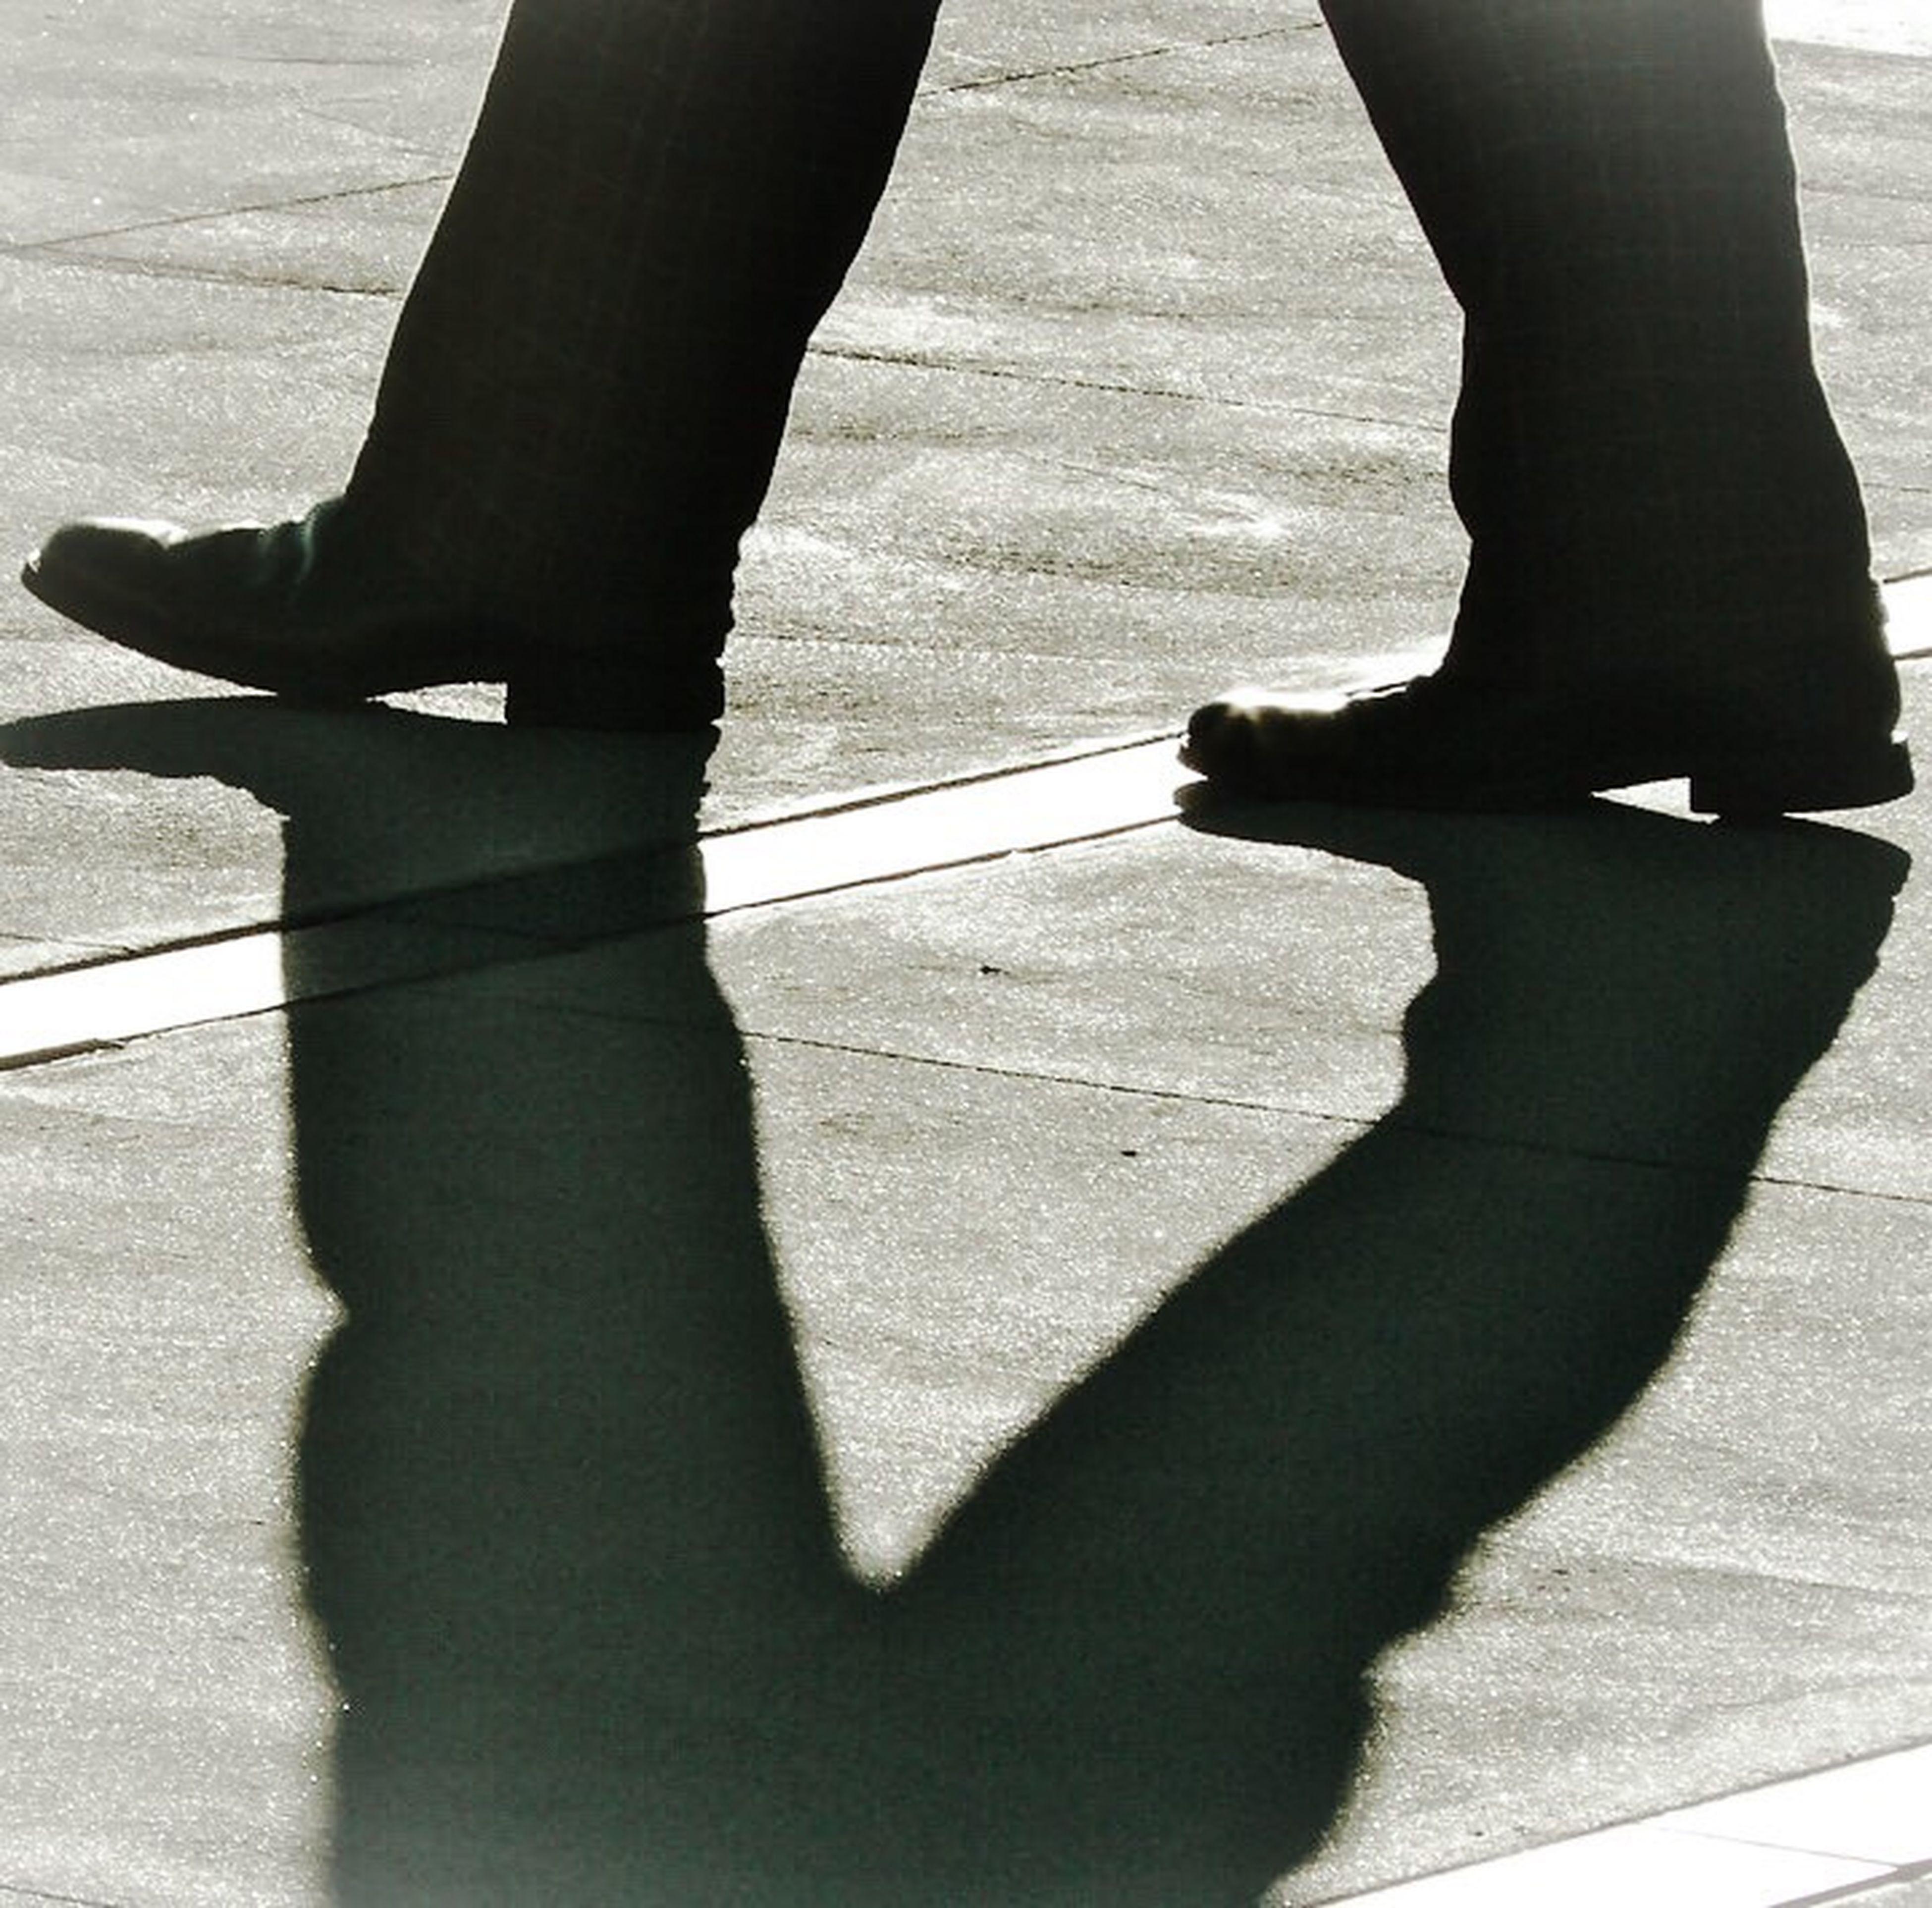 low section, person, lifestyles, standing, shadow, men, human foot, shoe, leisure activity, walking, street, sunlight, focus on shadow, footwear, road